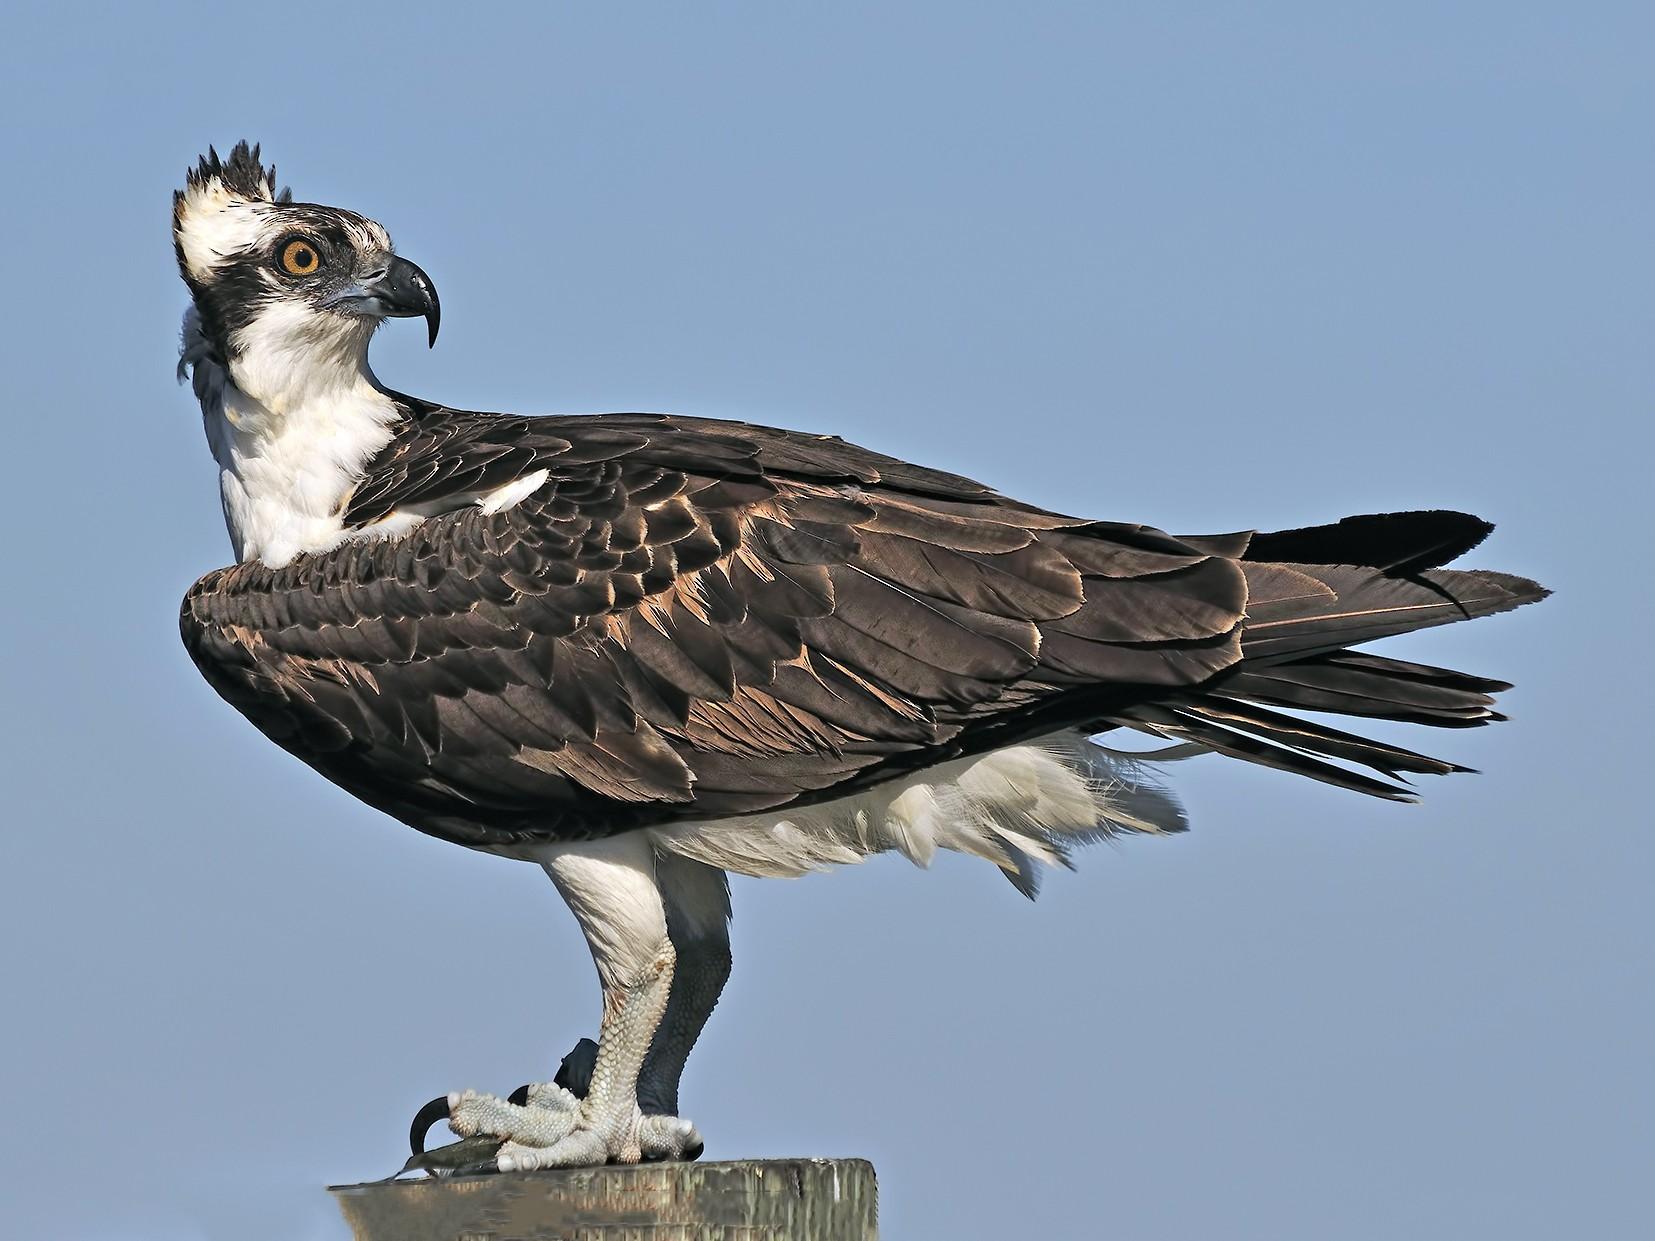 Águila Pescadora - Ferit Başbuğ